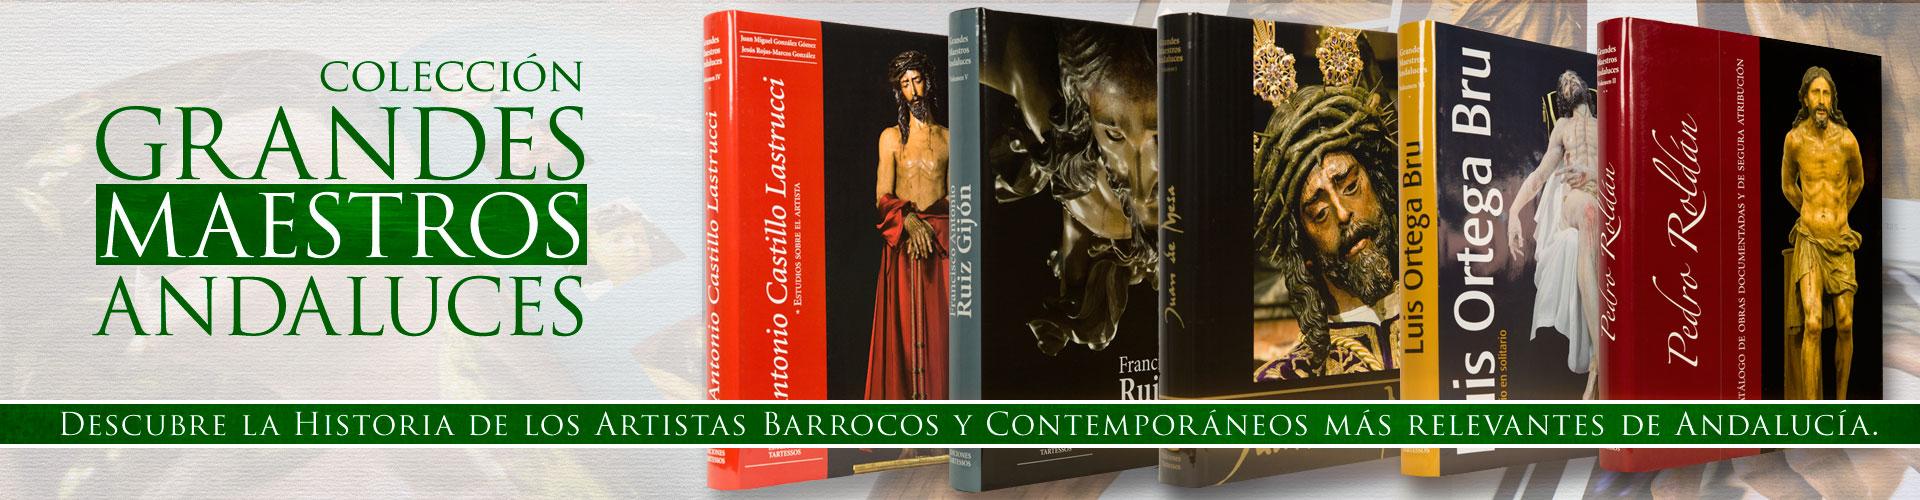 Grandes Maestros Andaluces del Arte Sacro.